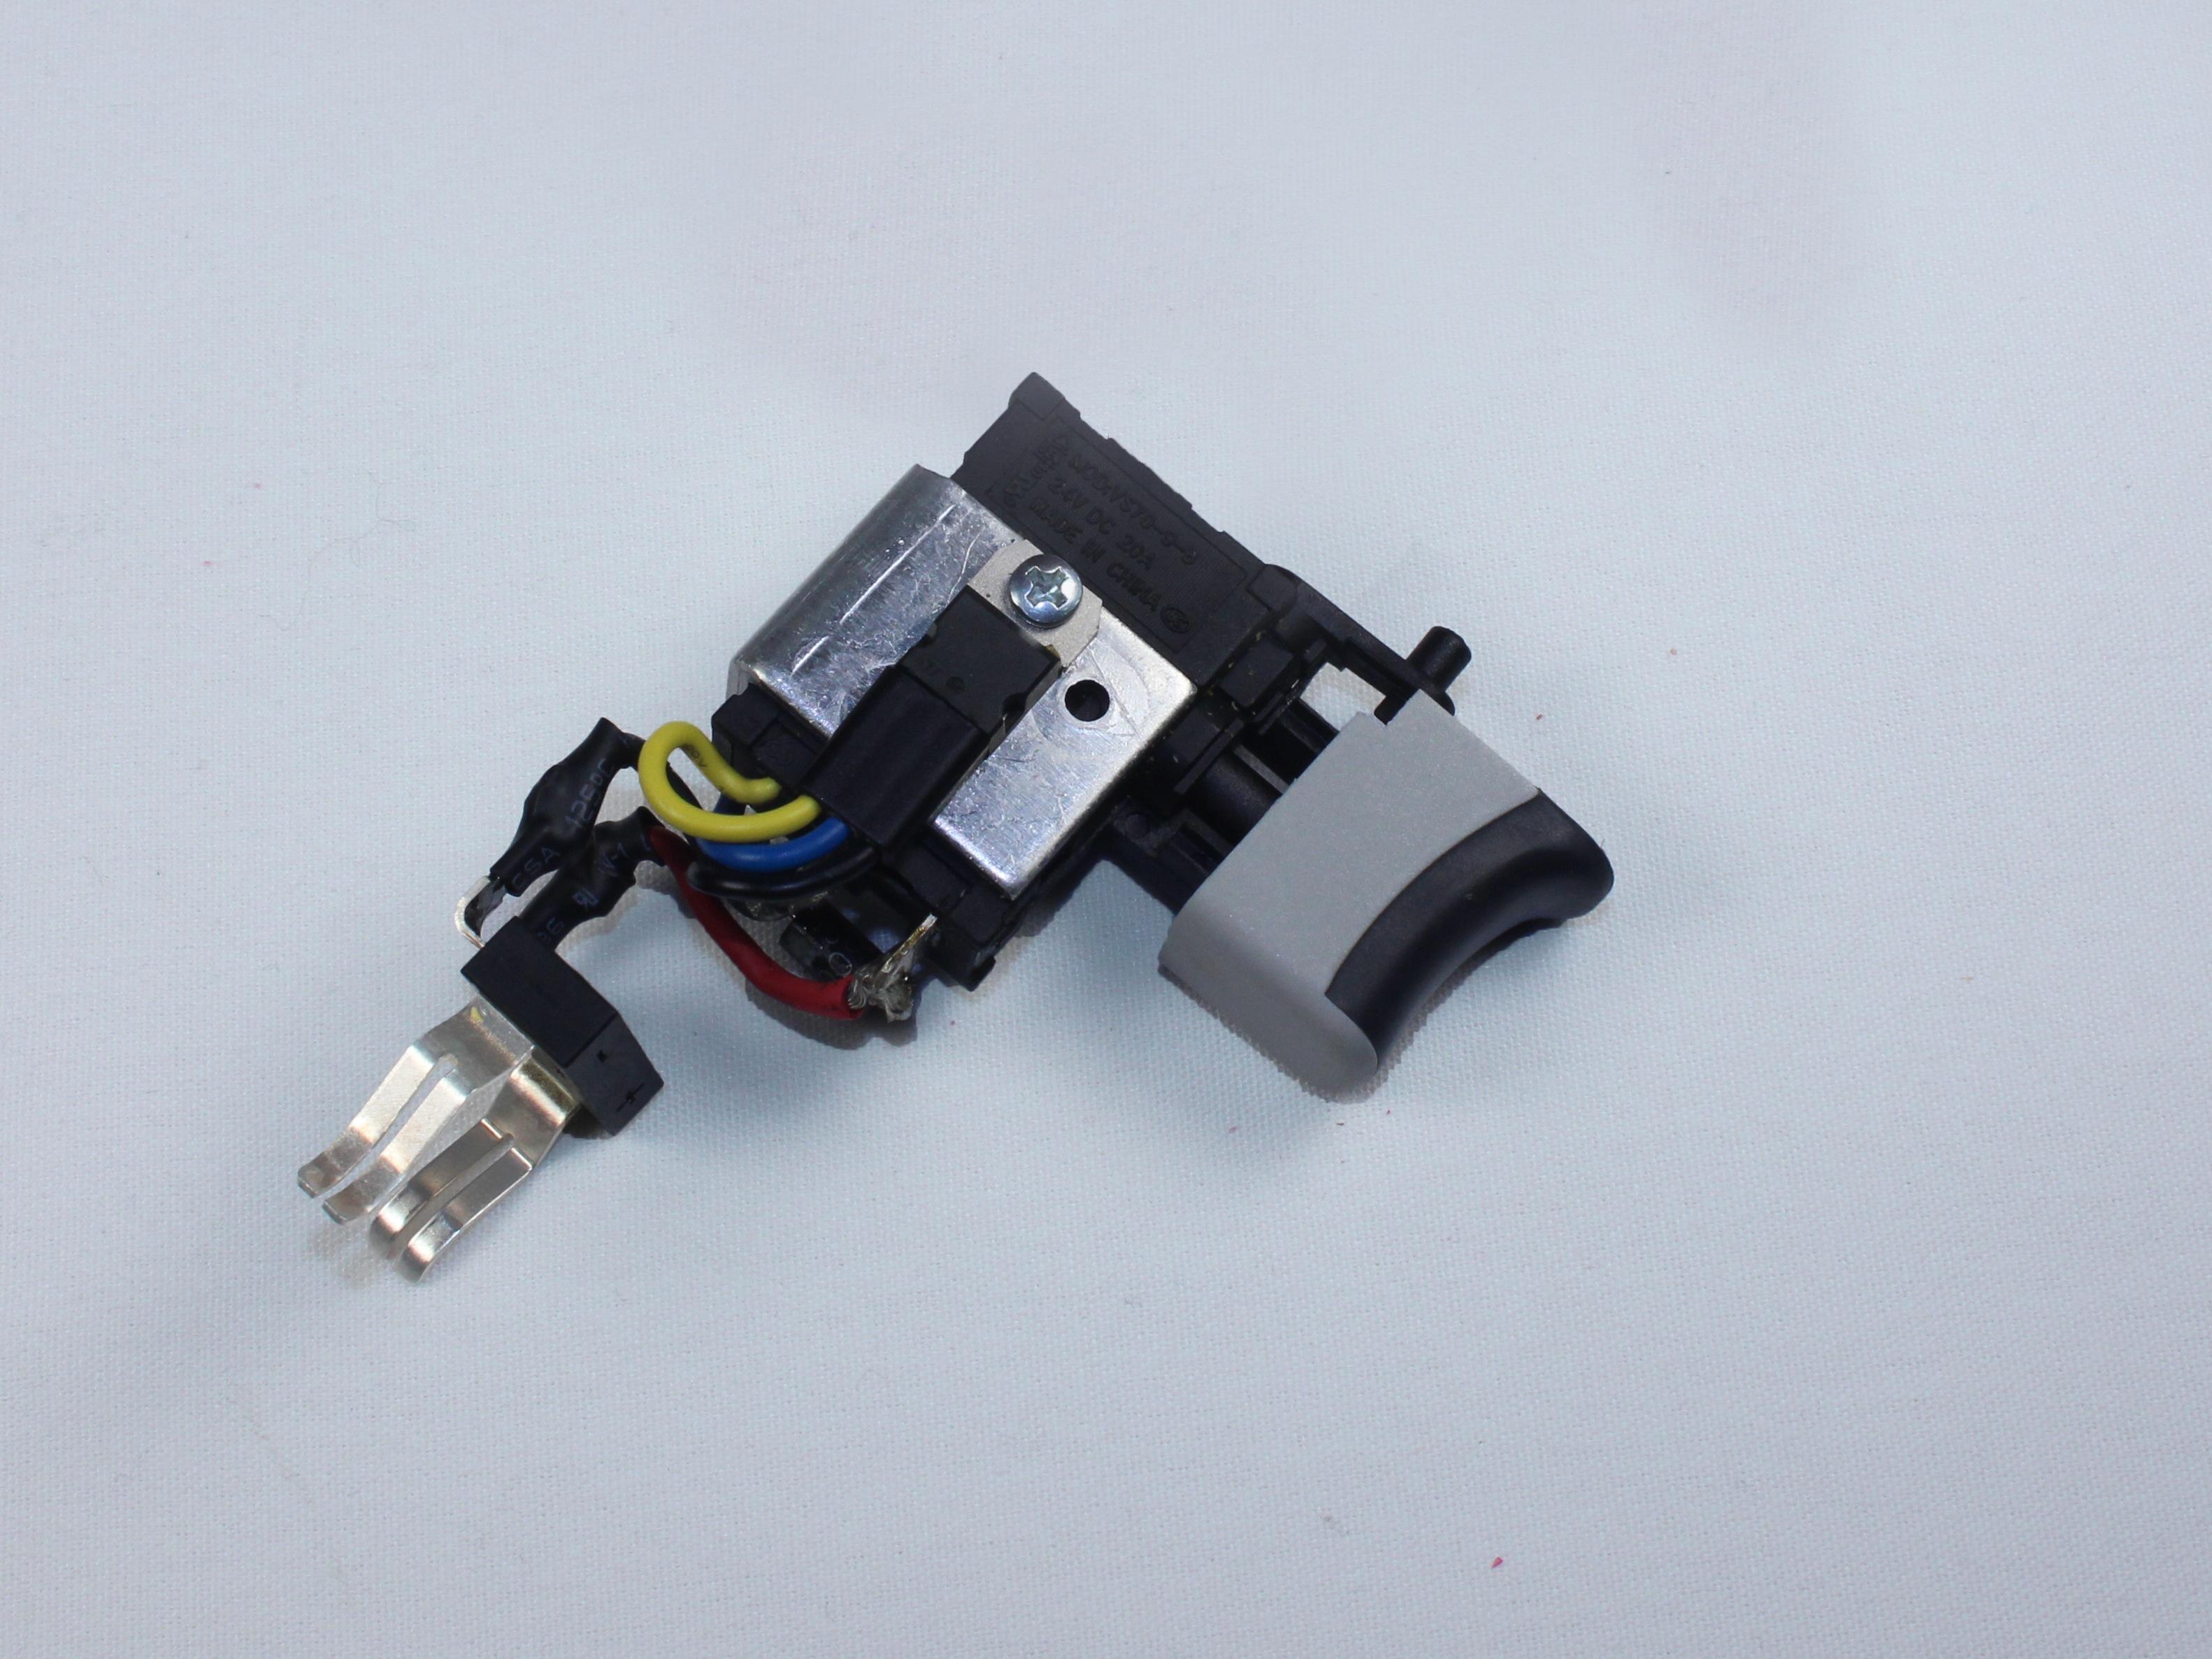 Ryobi P202 Repair - iFixit